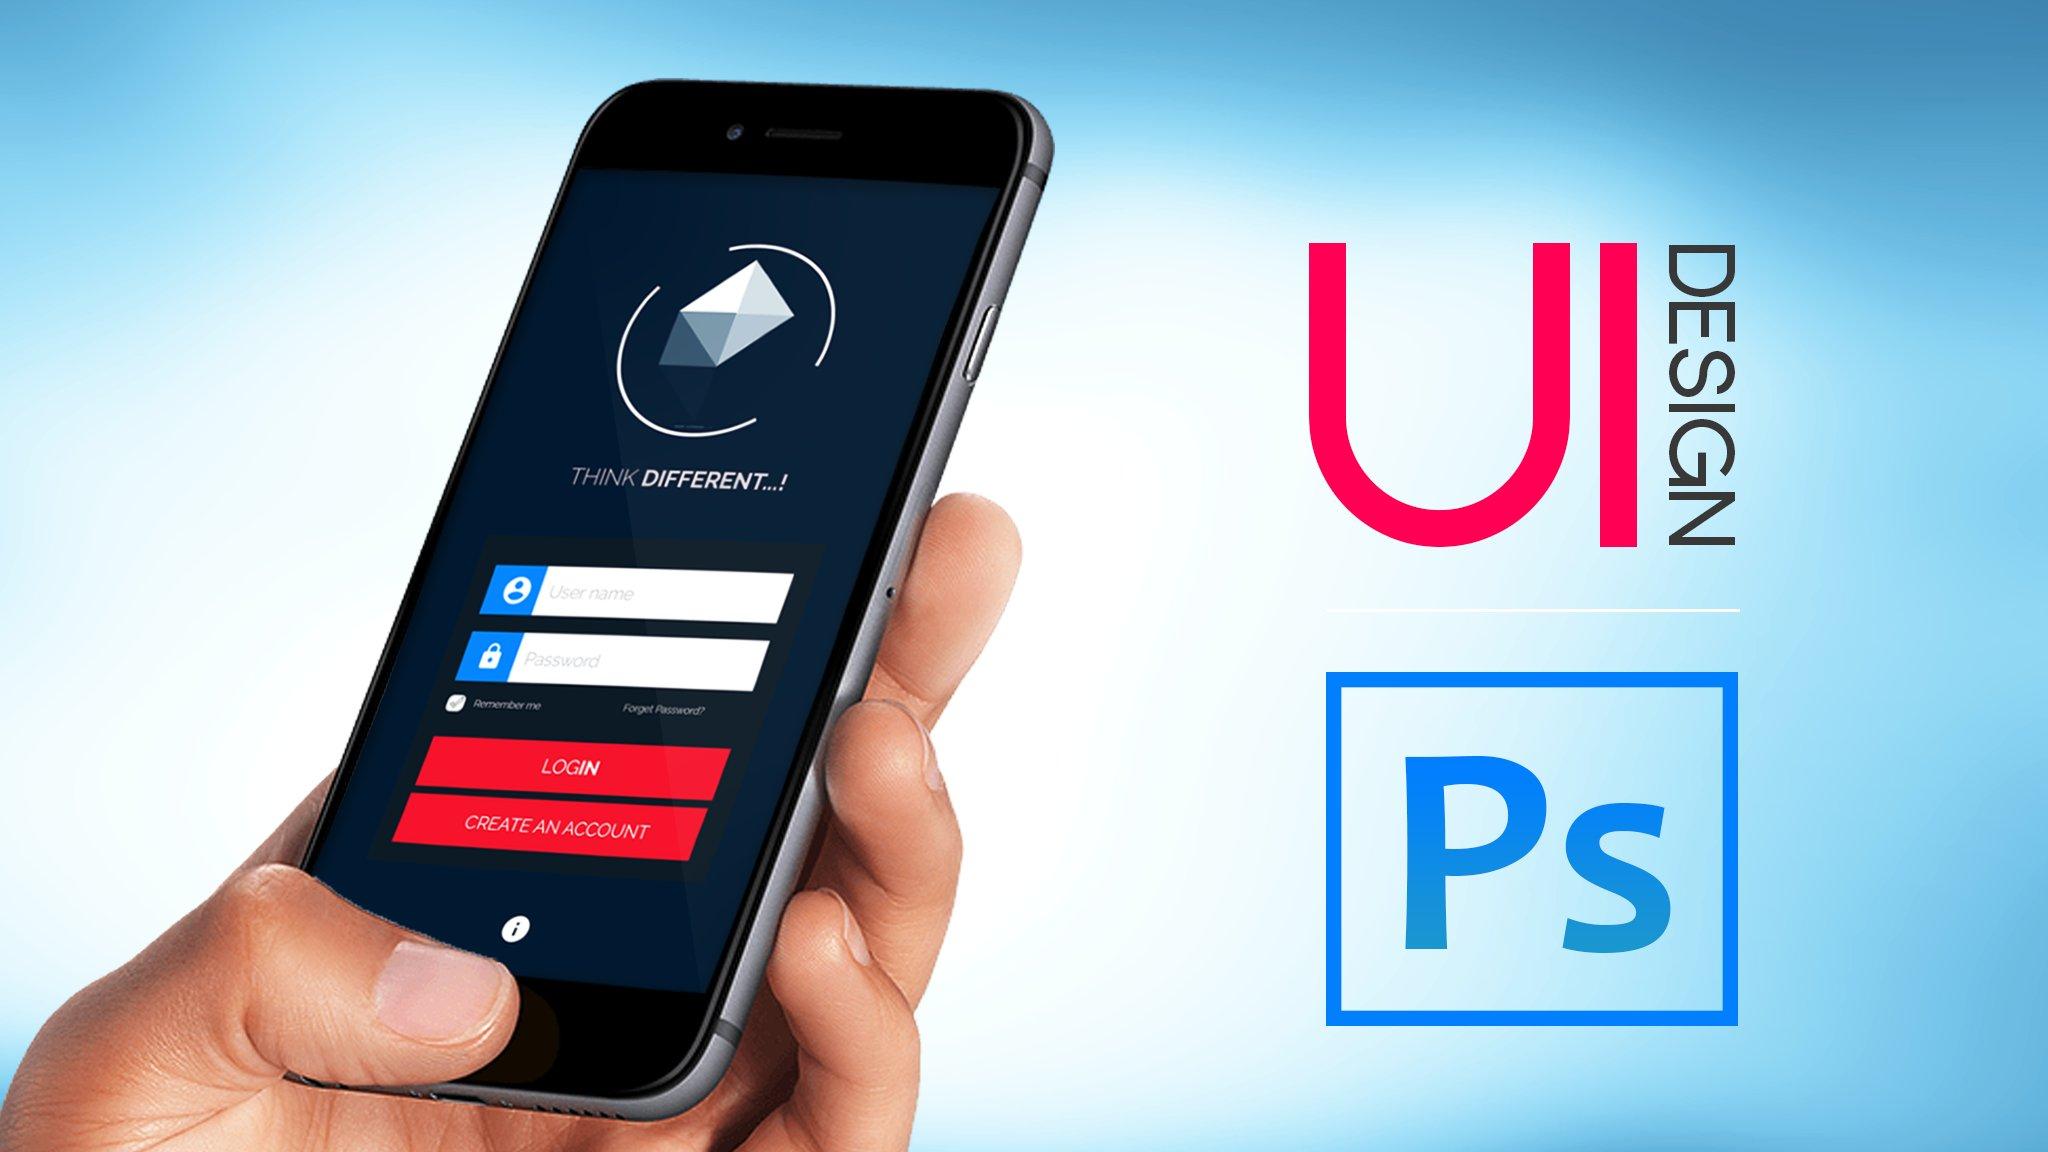 UI Design | Mobile App UI in Adobe Photoshop | HU Shahir